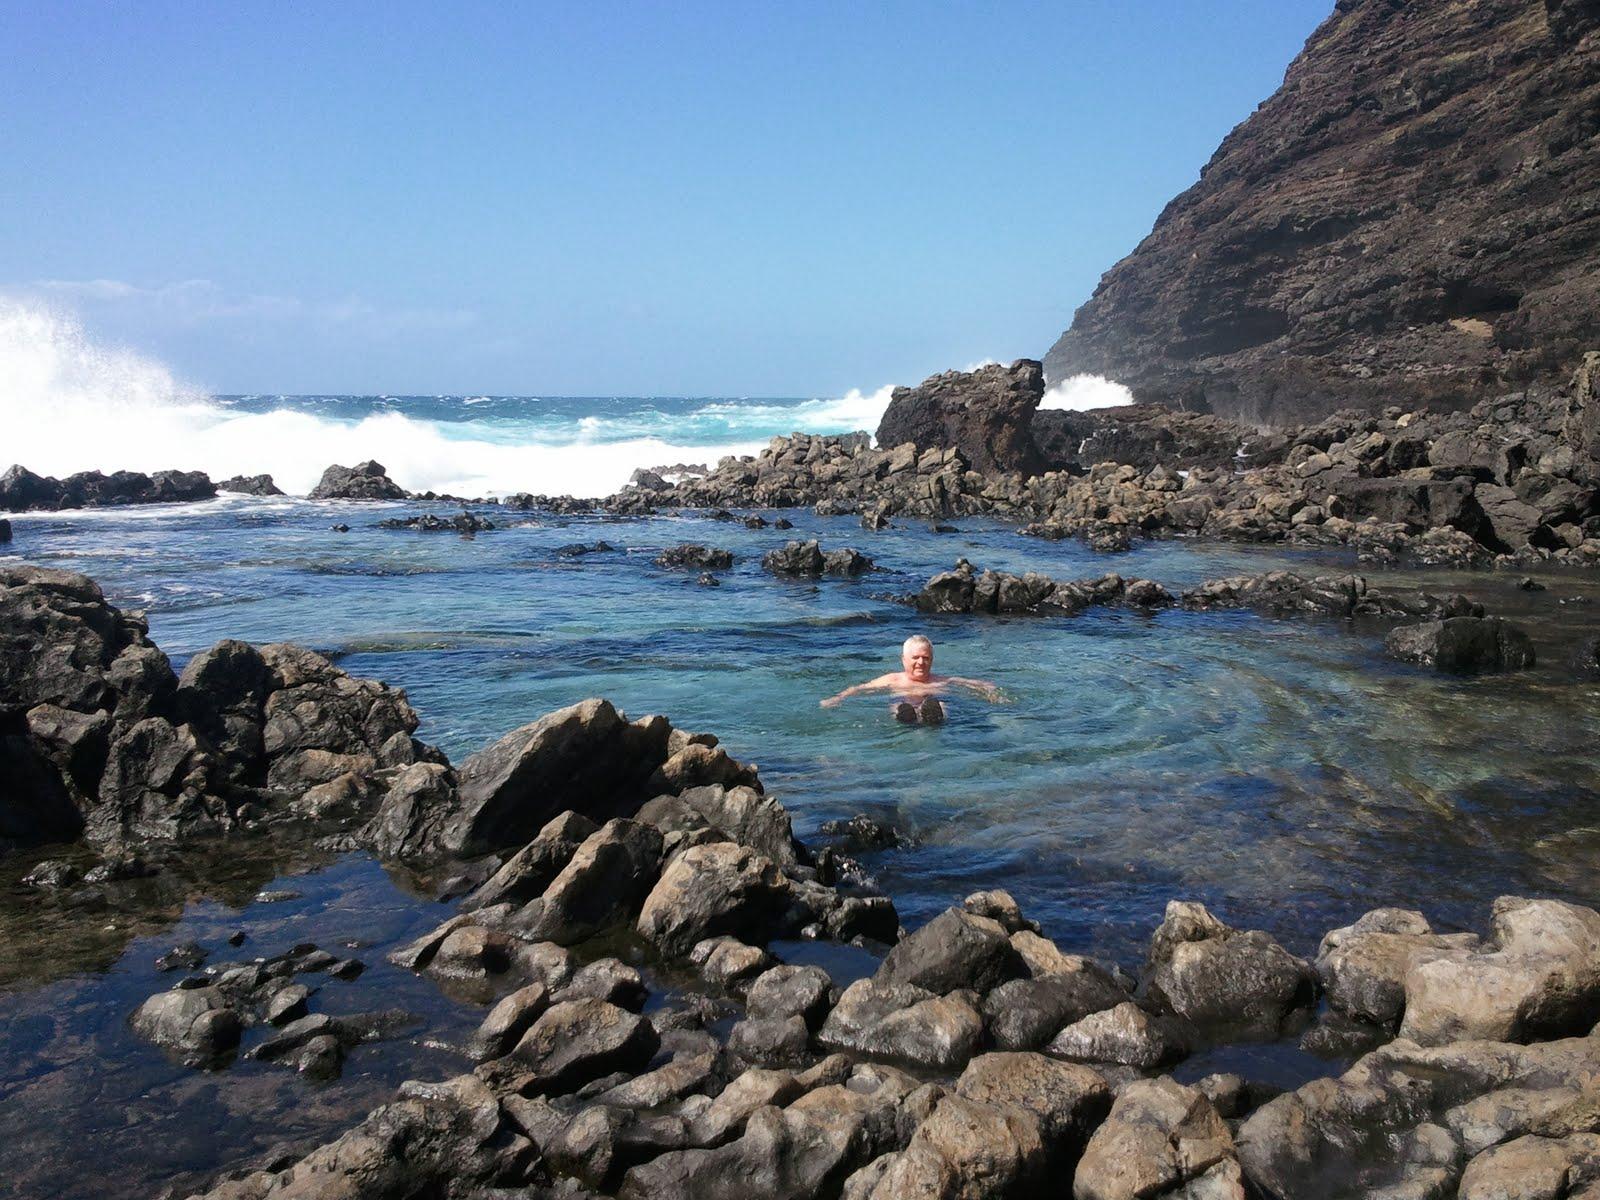 Click image for larger version  Name:Makapu'u Tidal Pool.jpg Views:114 Size:335.2 KB ID:81934